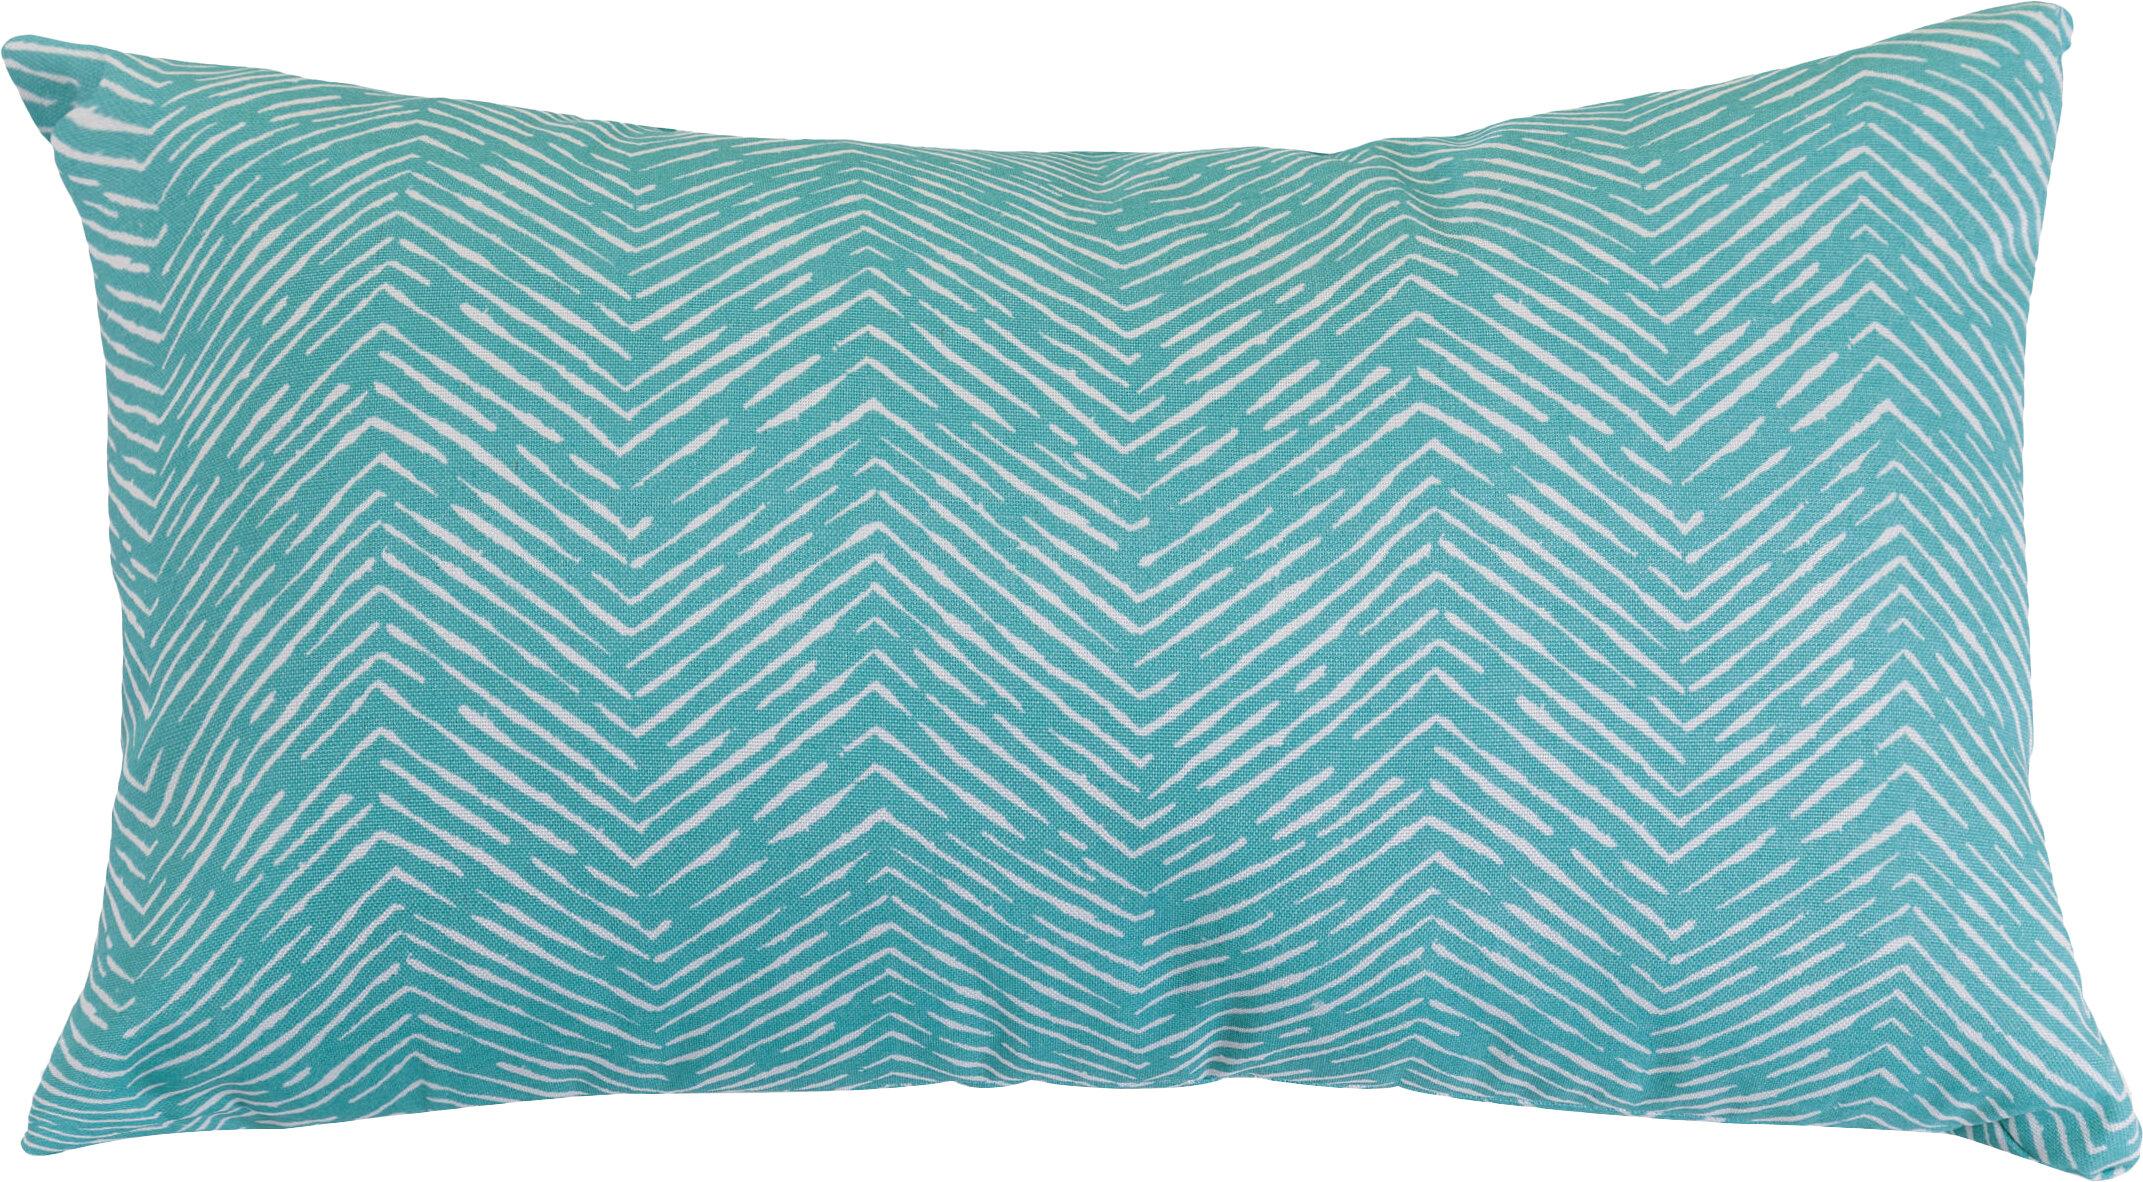 interior outdoor cdbossington pertaining lumbar beautiful patio perfect pillow pillows for relaxing to accessories decorating design dragonfly